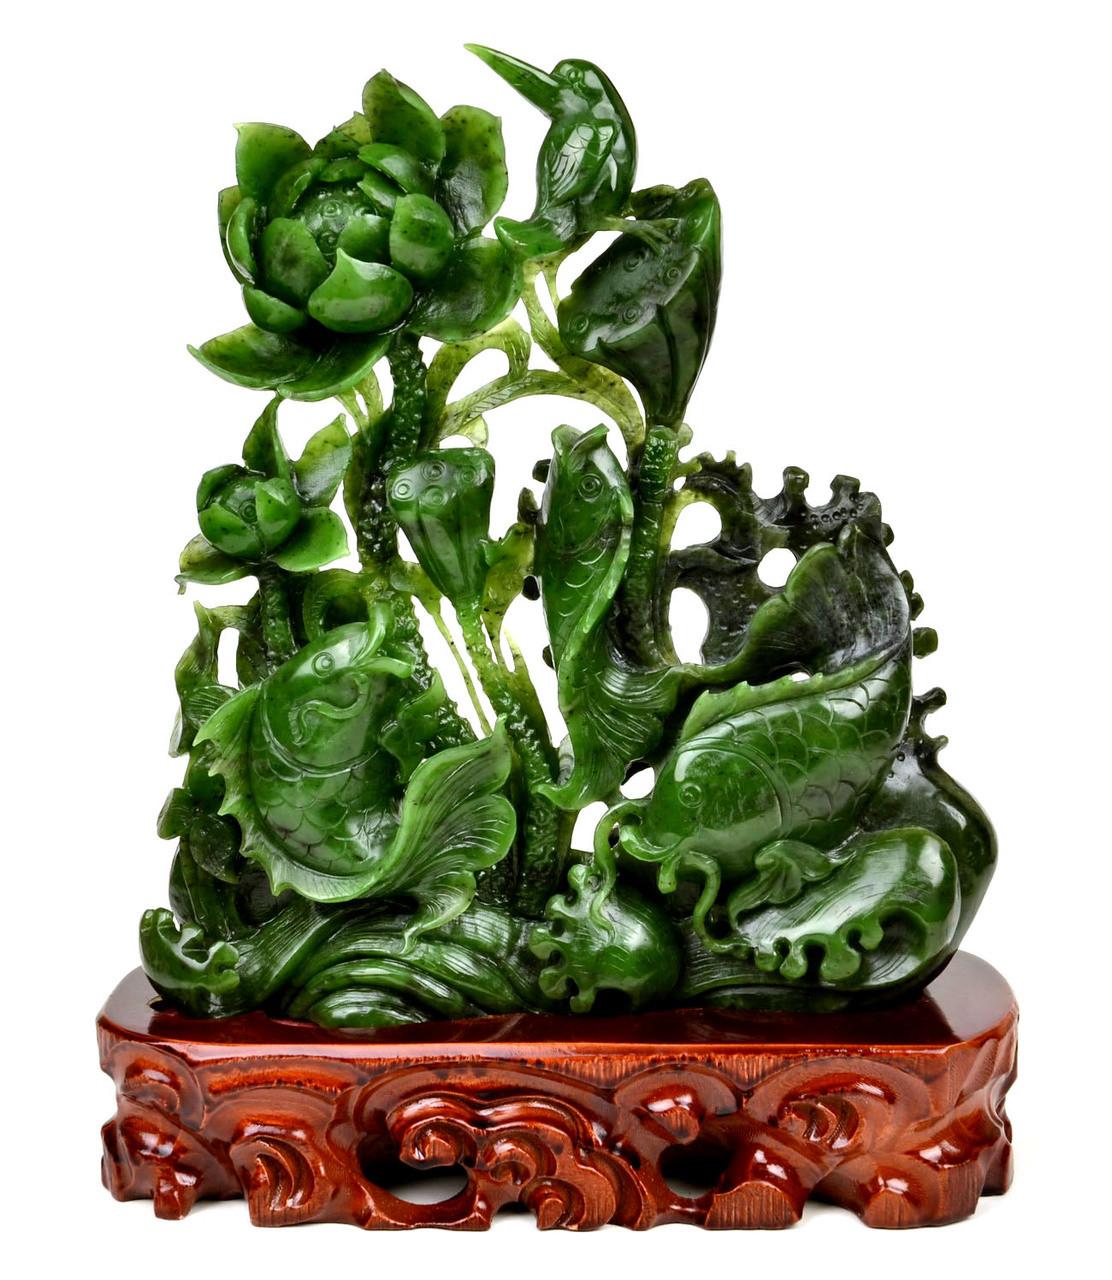 Green Nephrite Jade Lotus Koi Fish Sculpture